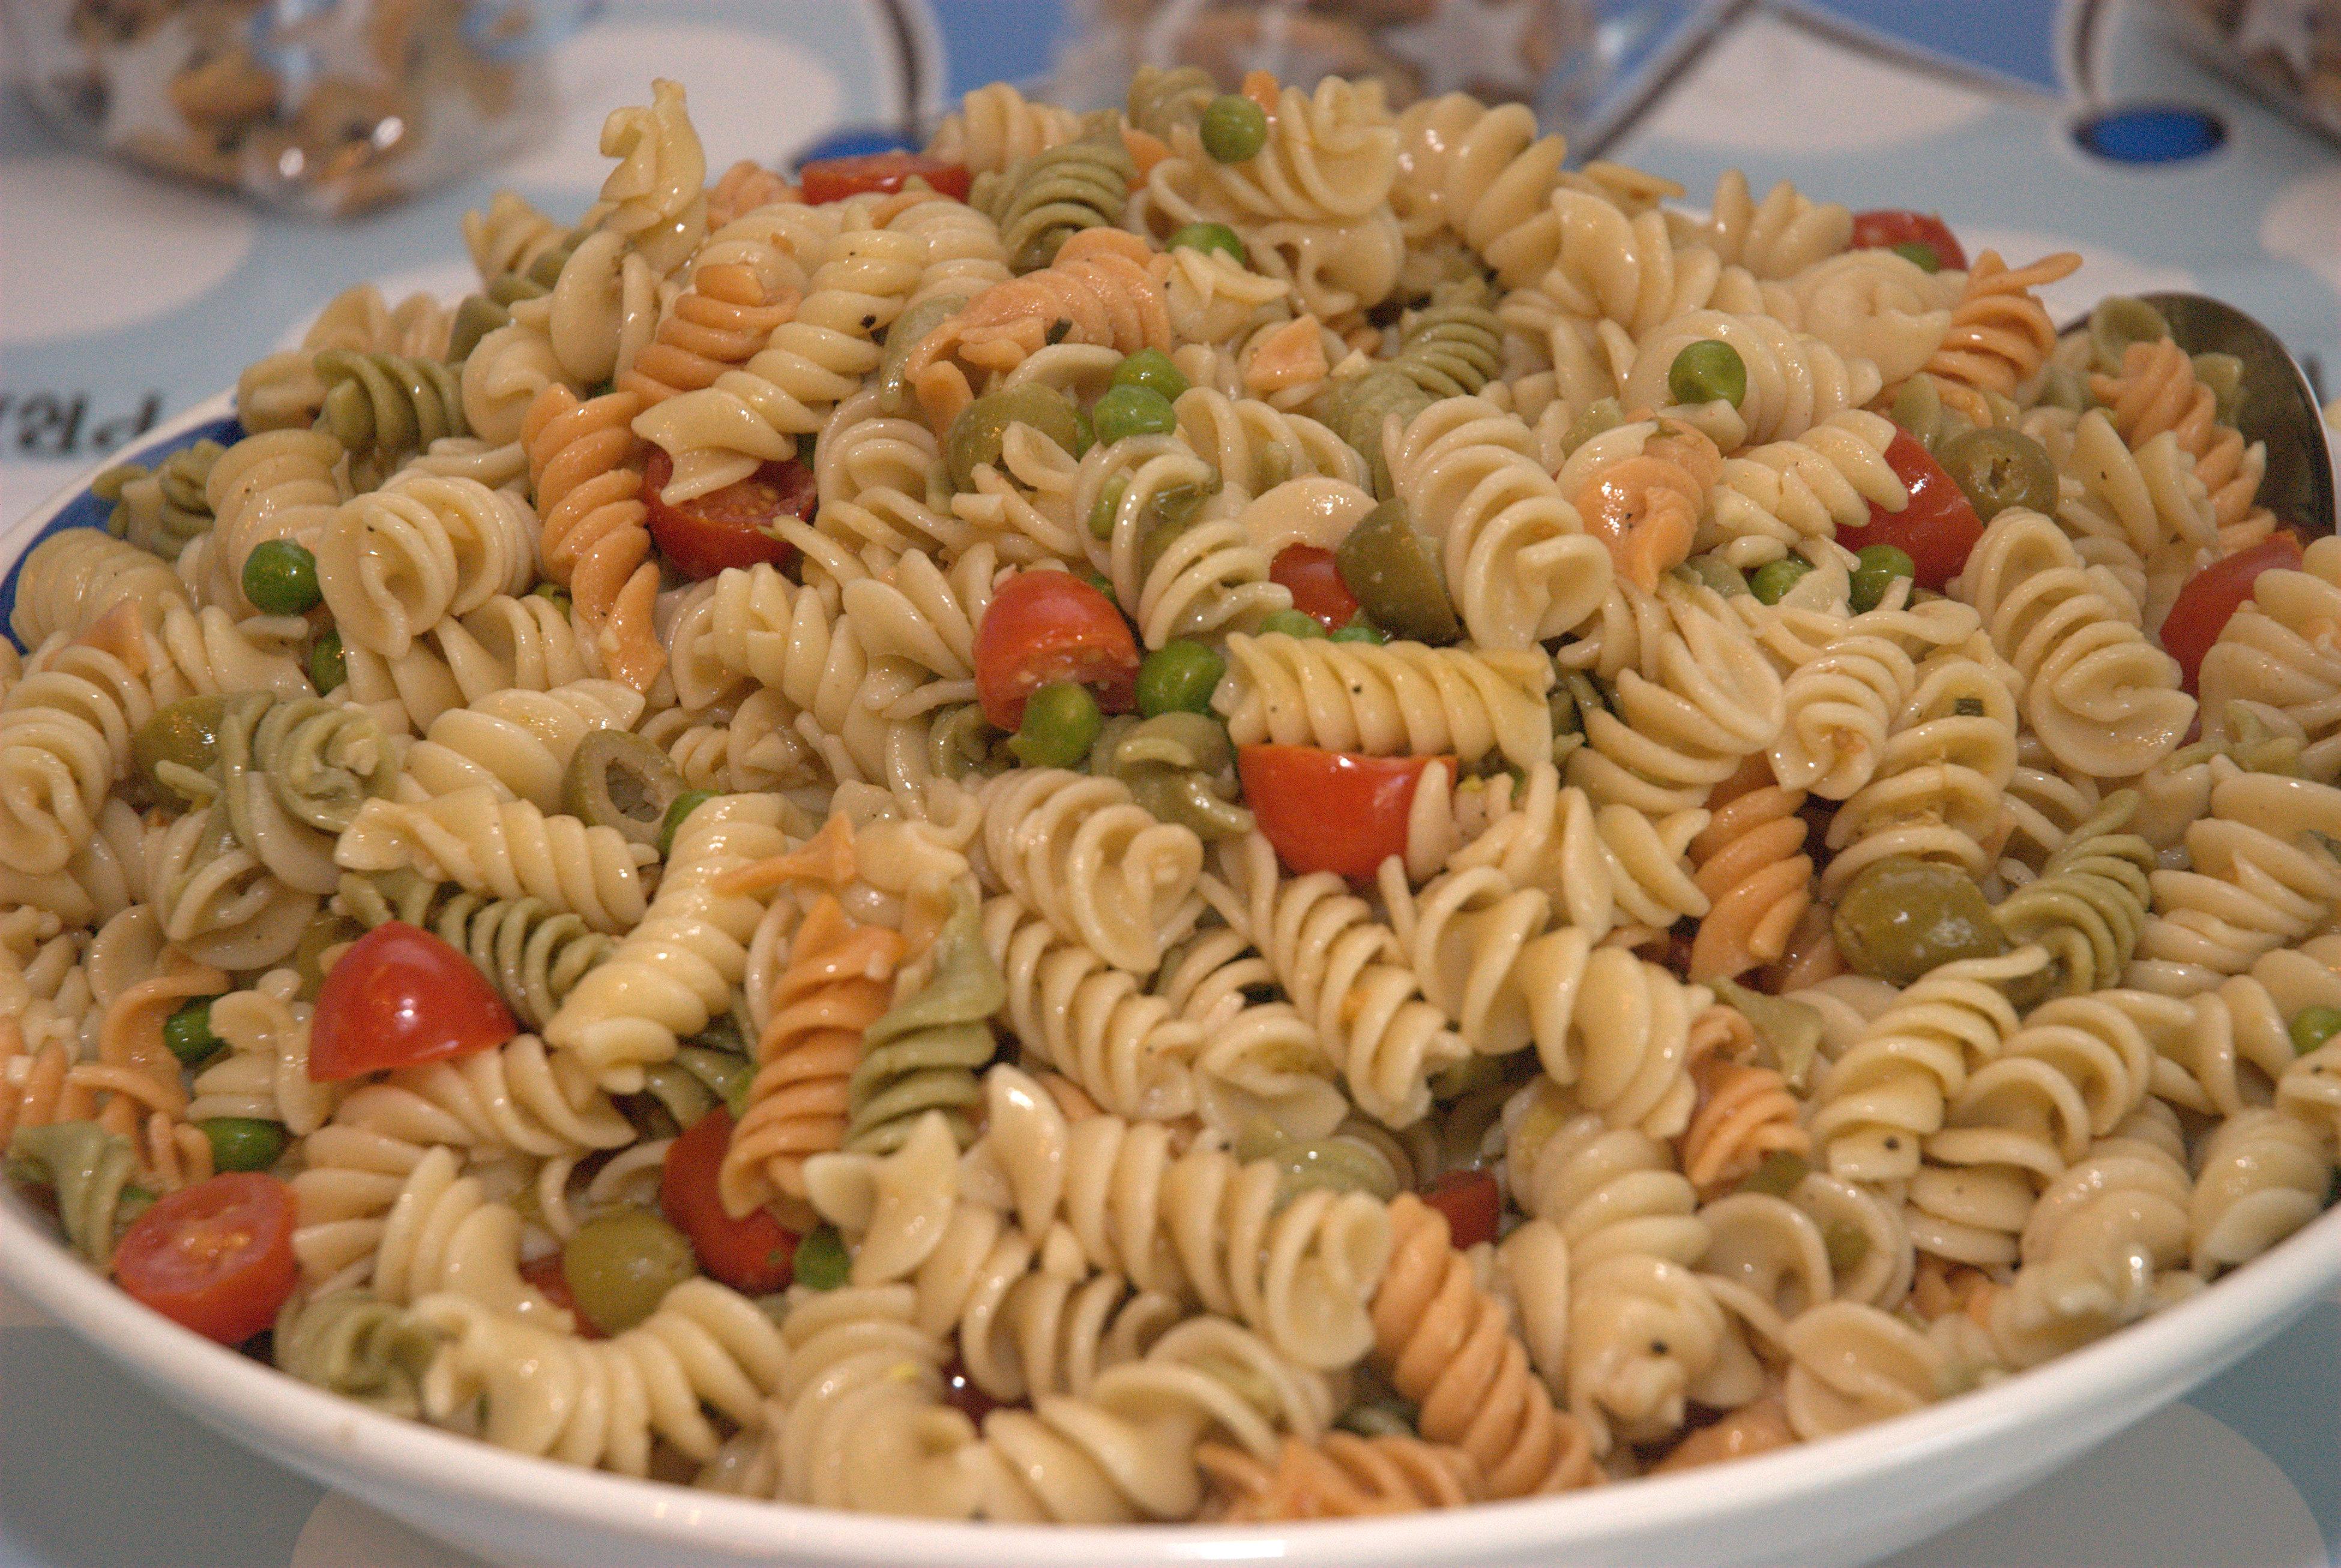 Cold Pasta Salad Dressing